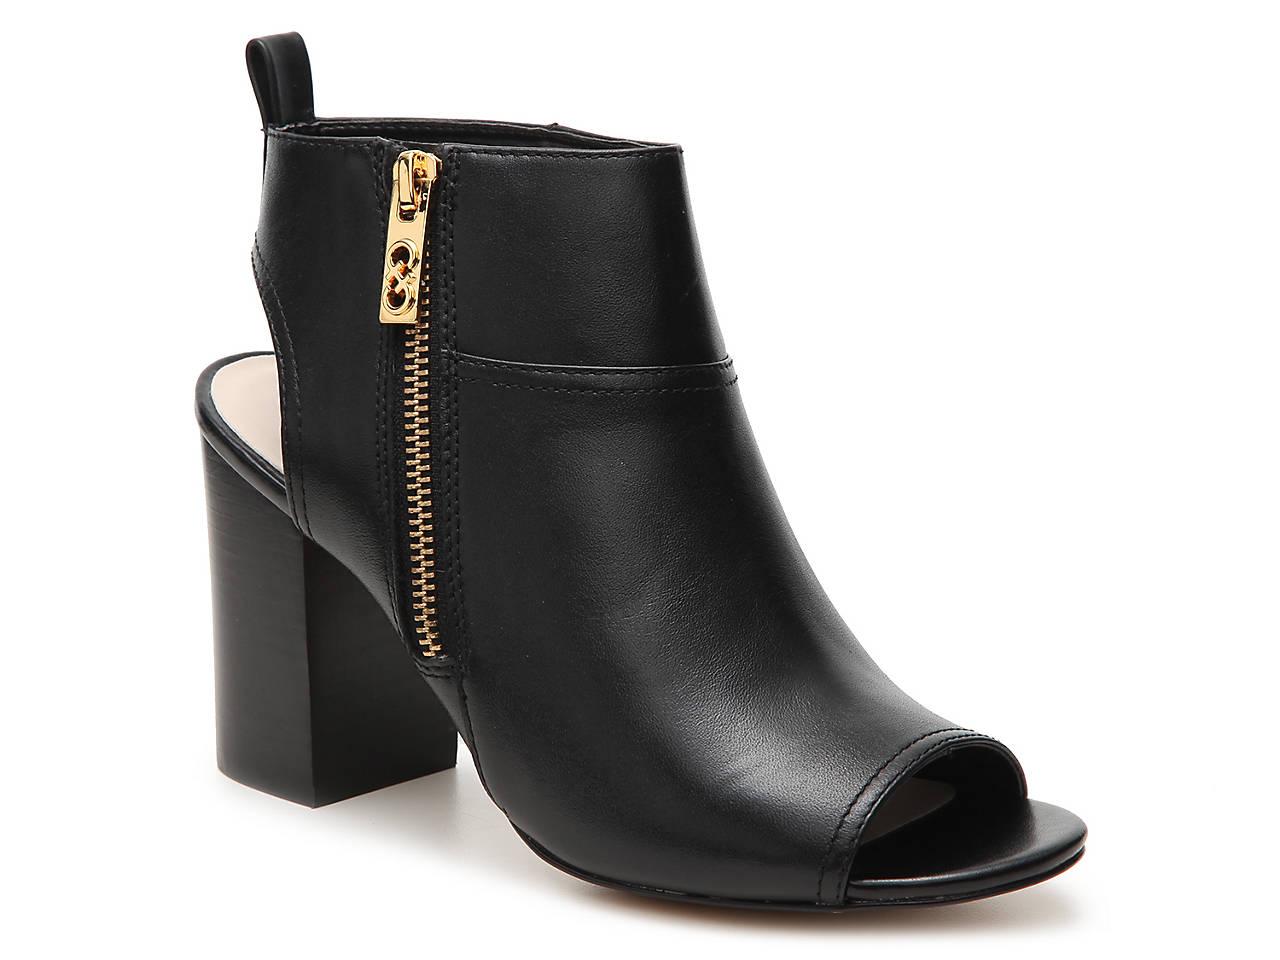 fd5ec5166d Cole Haan Zula Sandal Women's Shoes | DSW